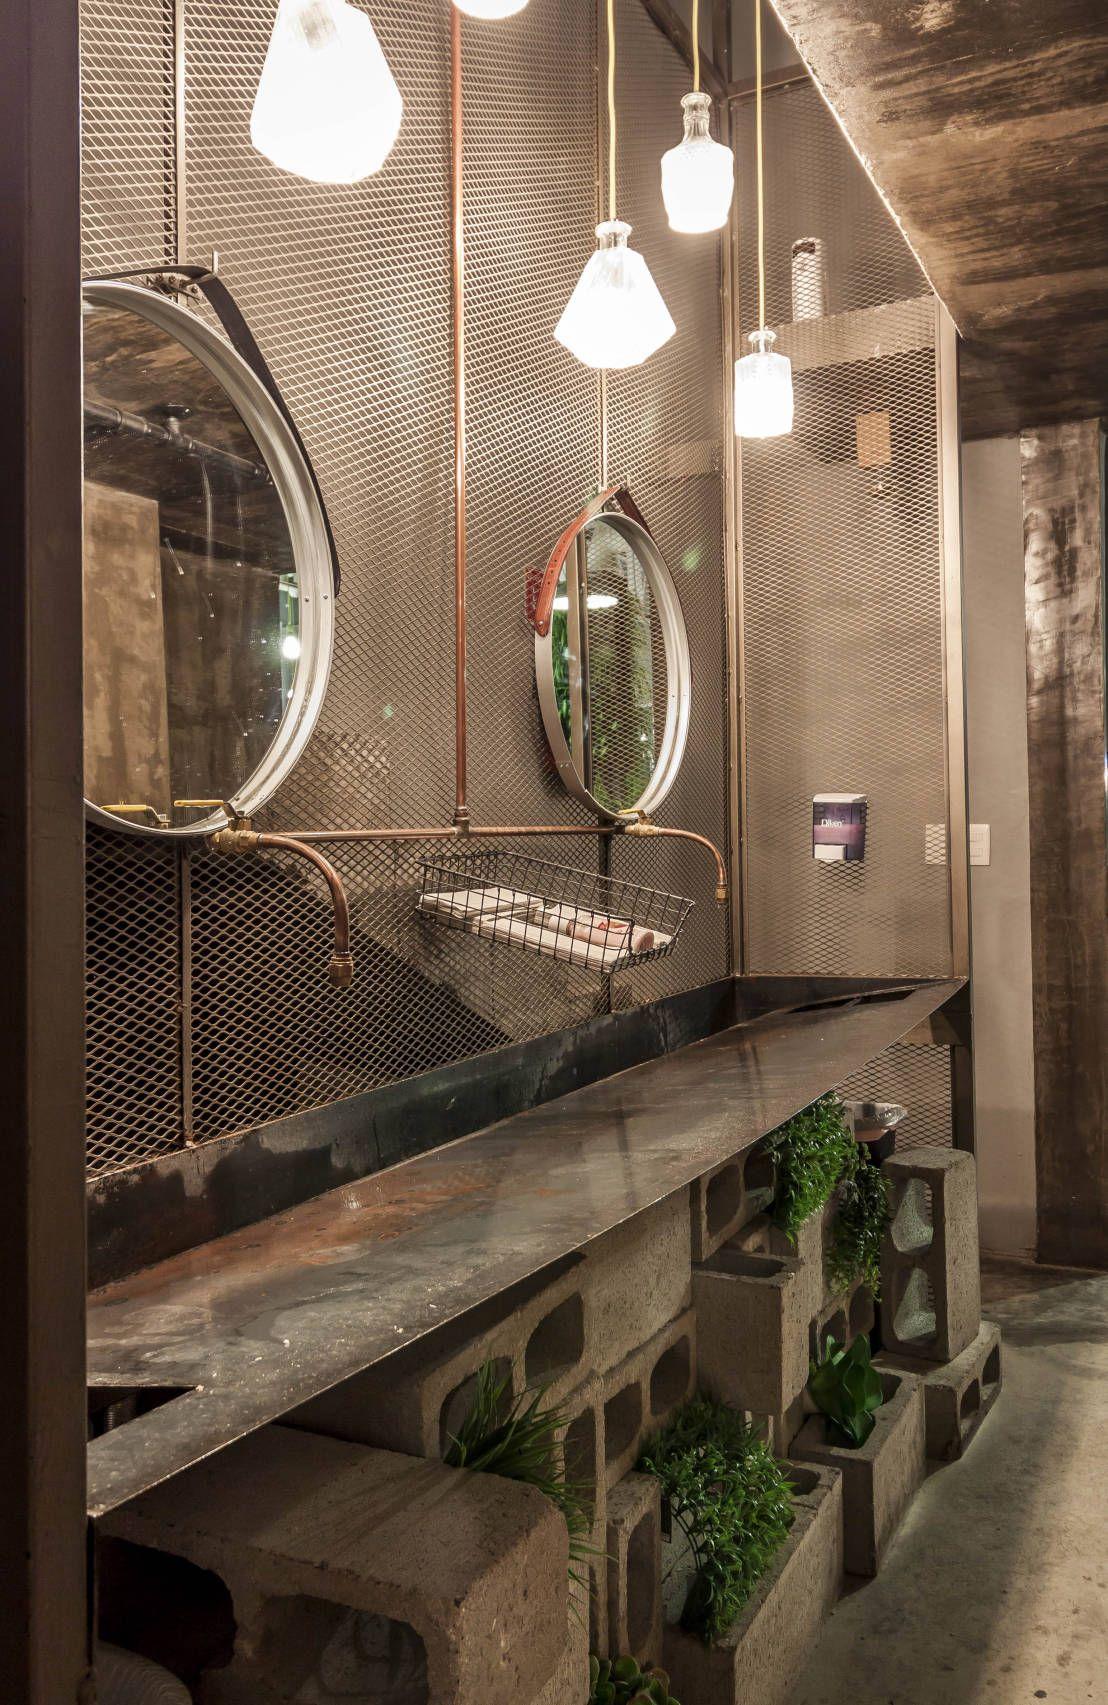 10 ideas fabulosas para dise ar tu ba o bathroom for Innendekoration restaurant